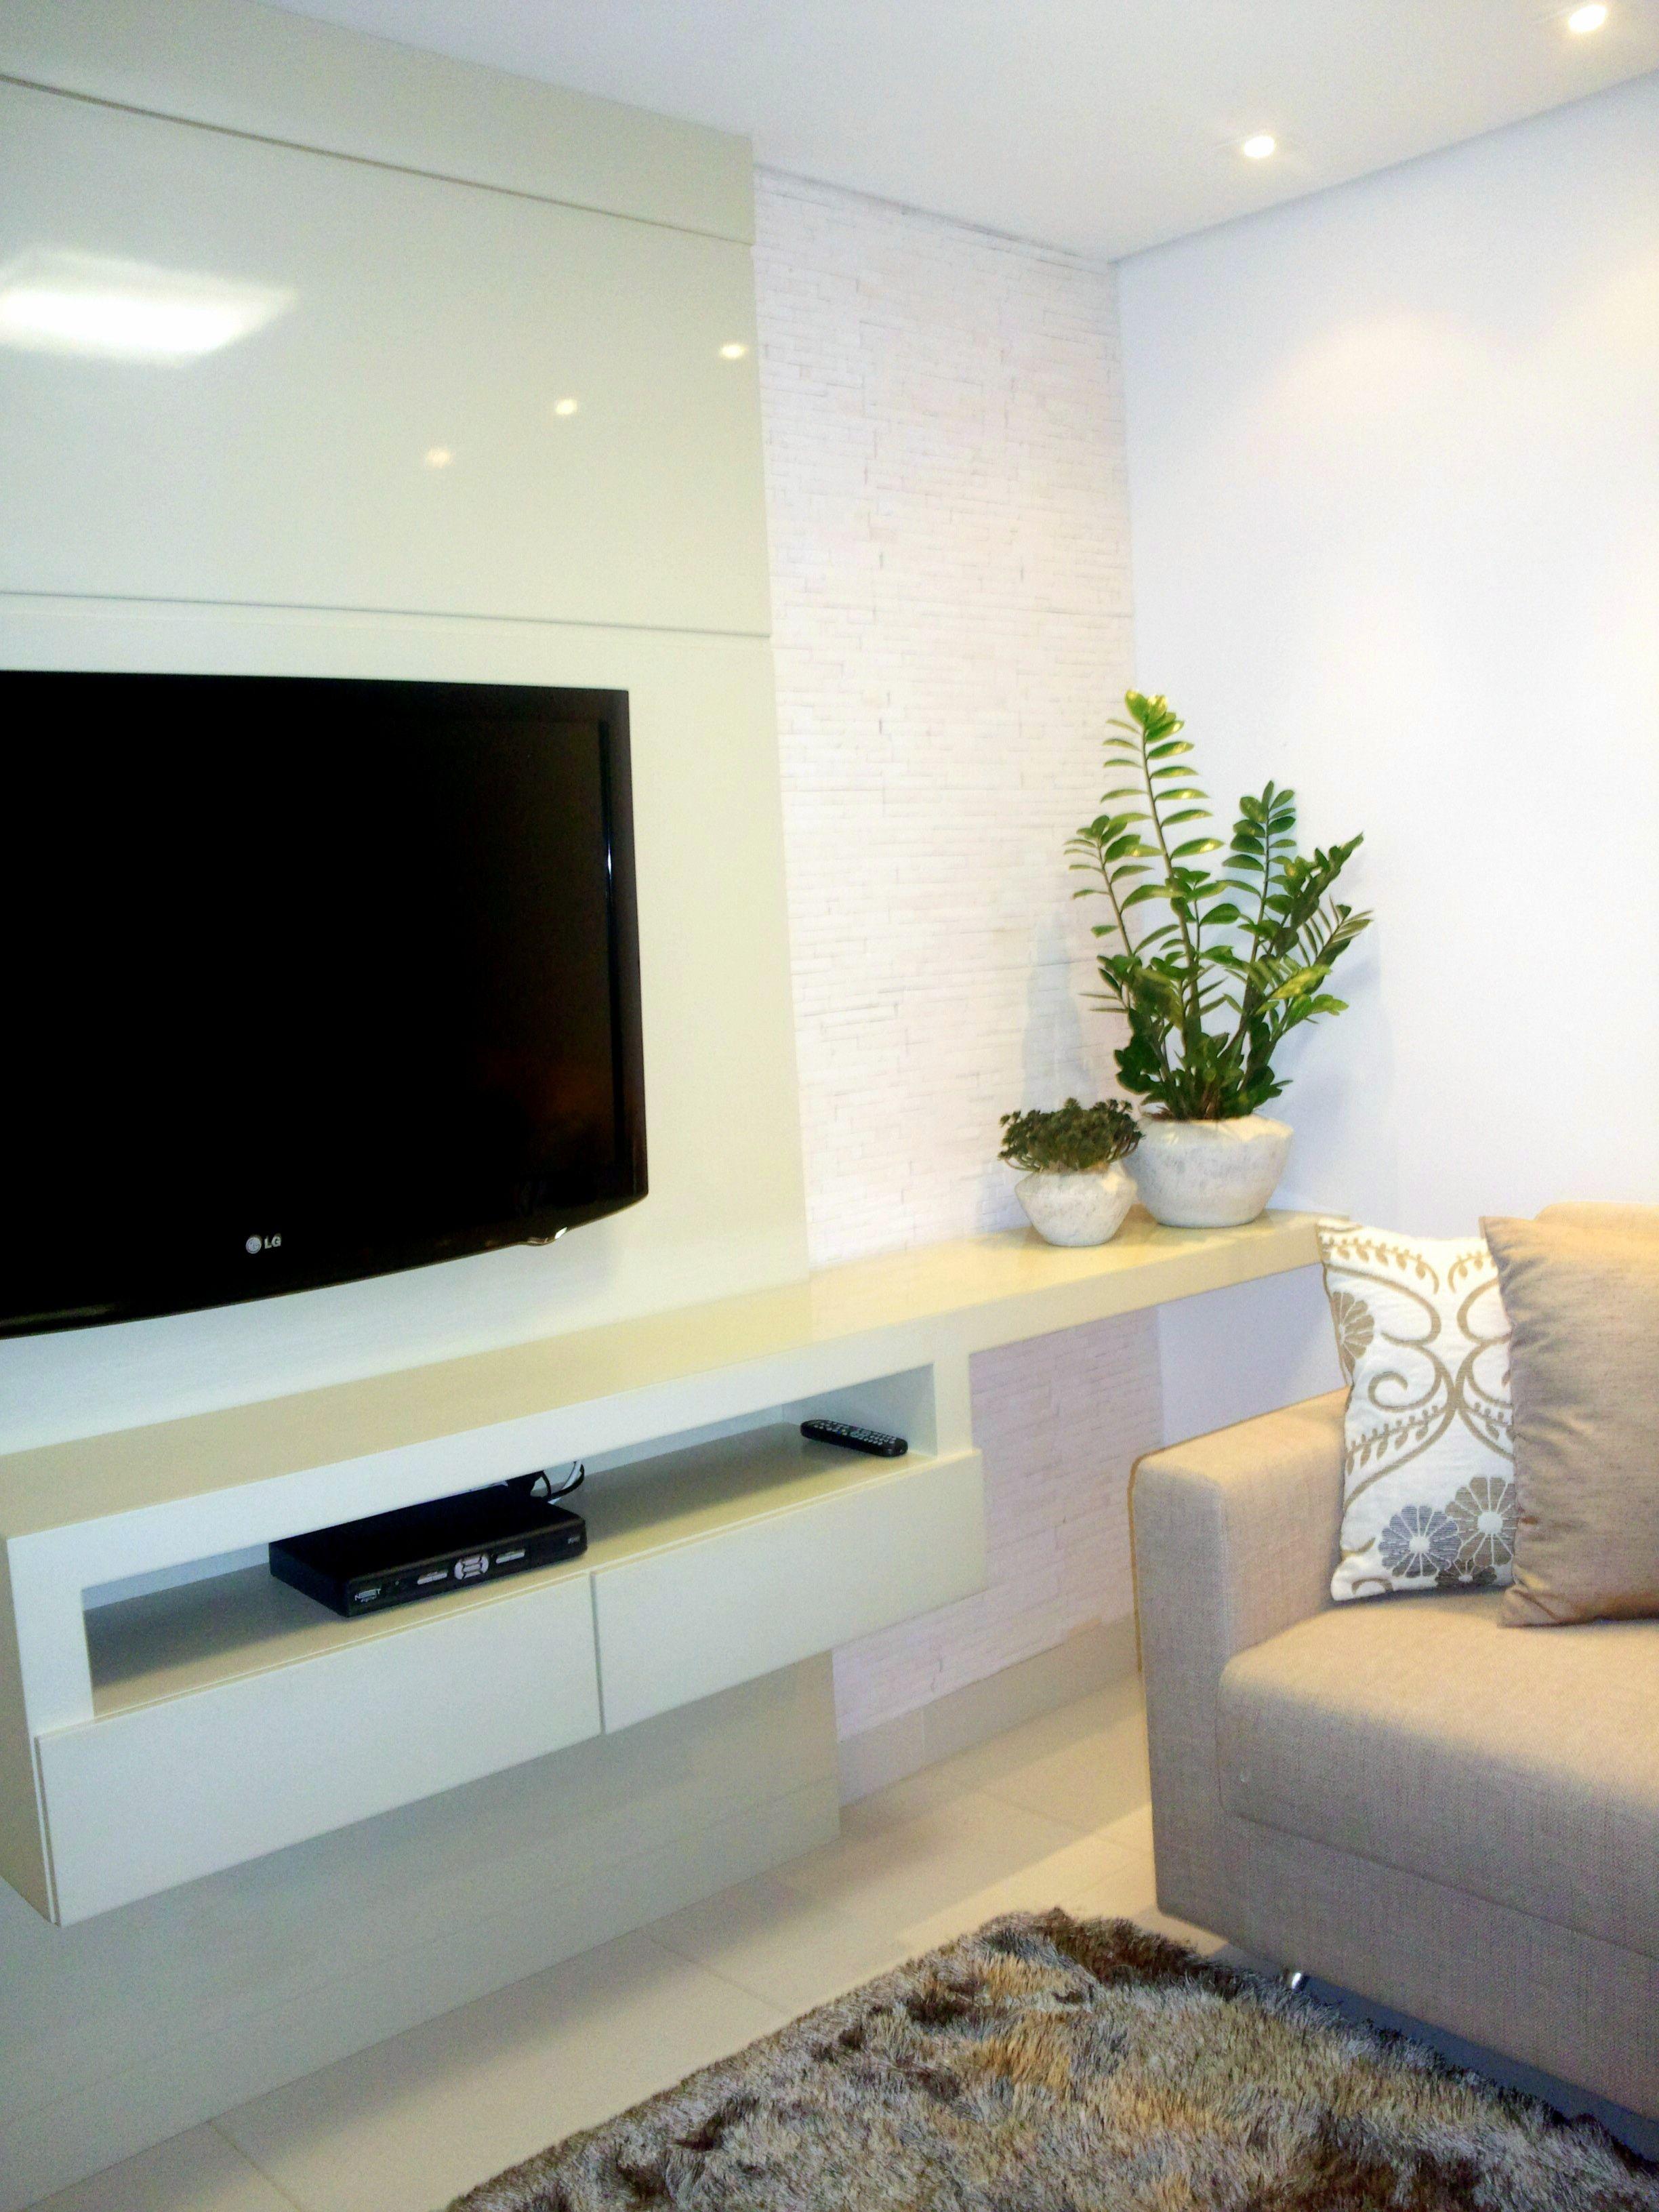 painel tv sala estar House decor en 2019 Tv decor, Tv rack y Decor # Decoração De Sala De Estar Com Painel De Tv